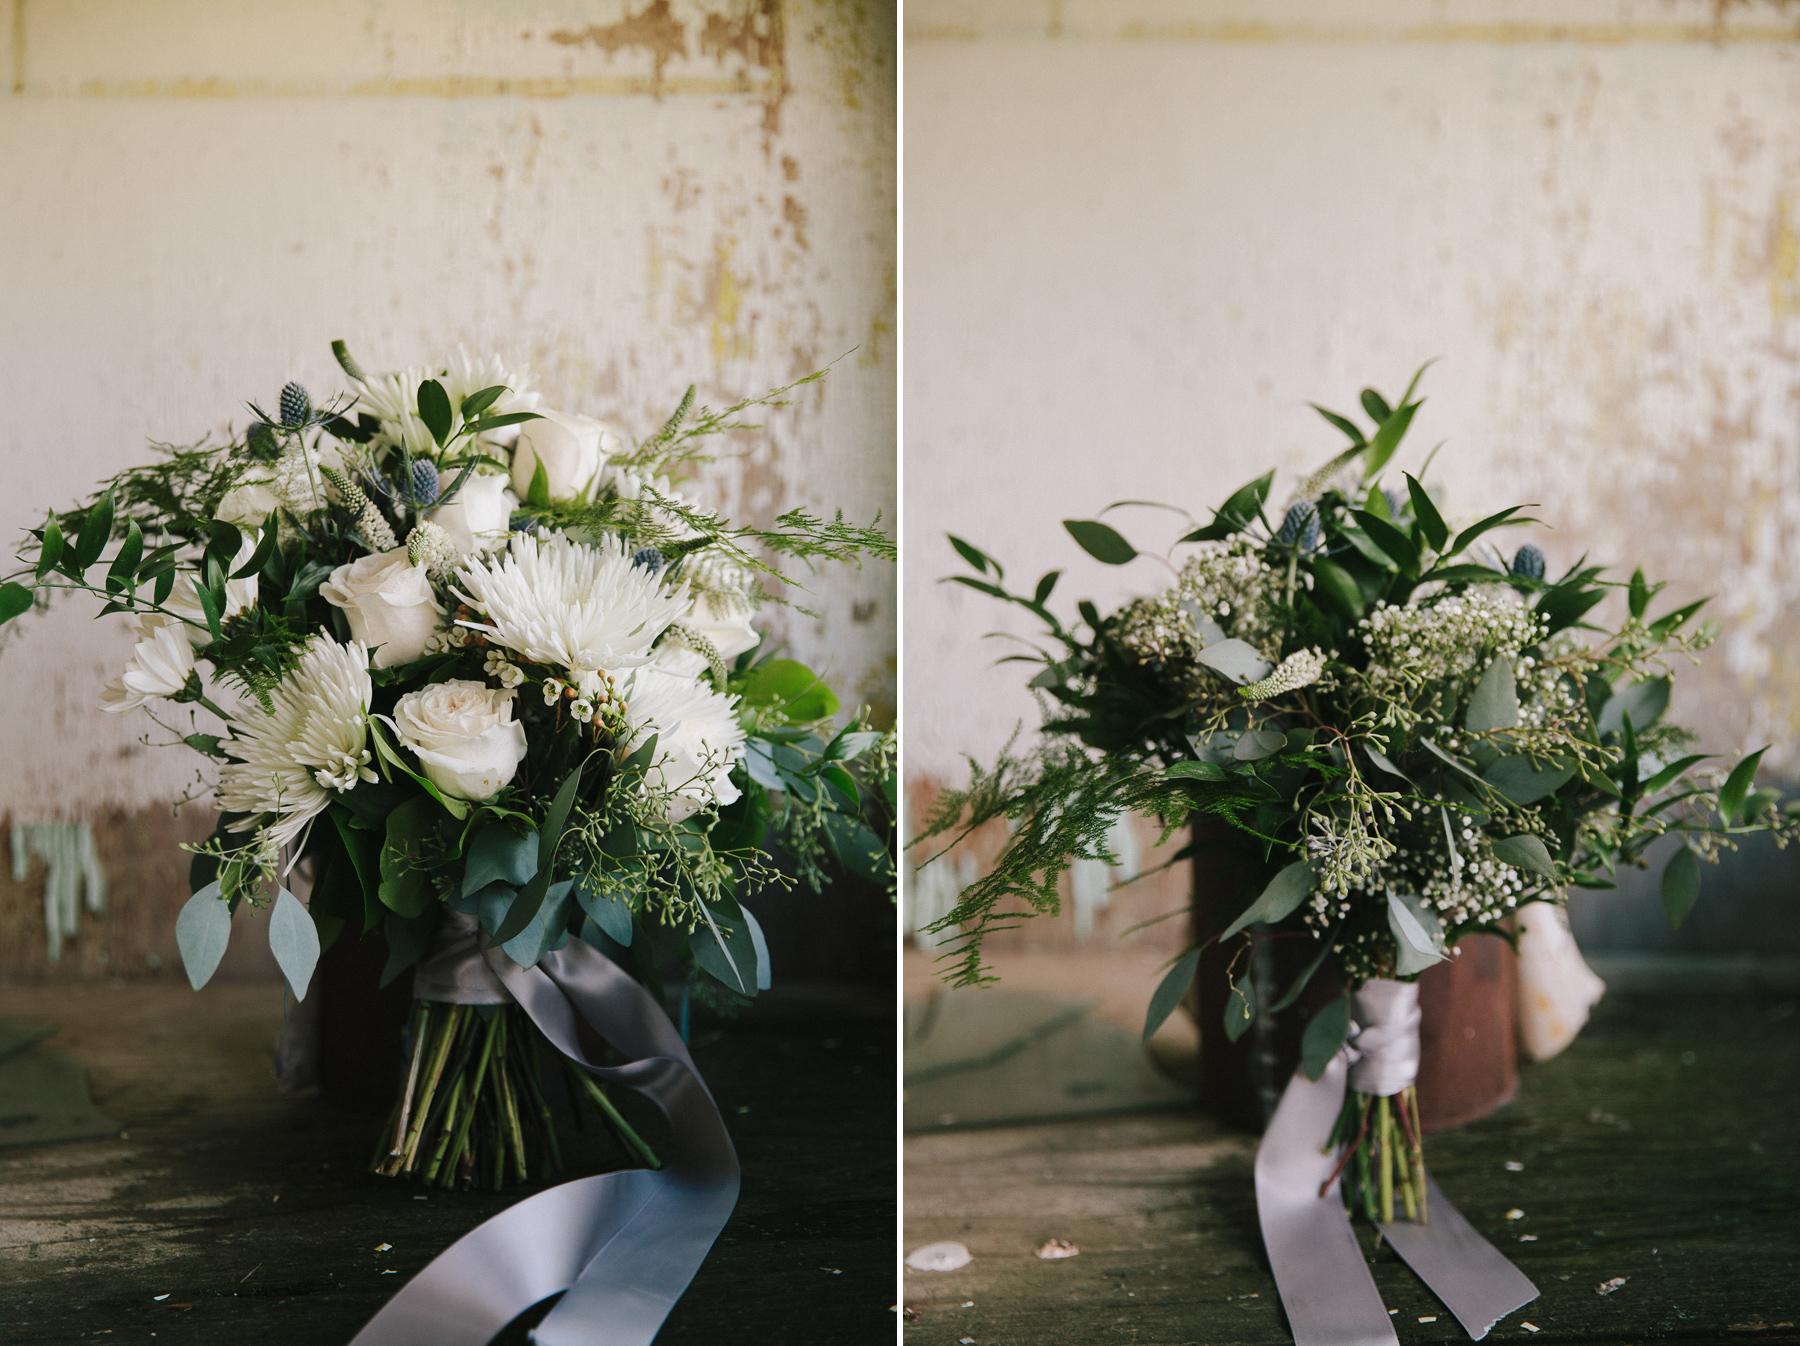 alberta-farm-wedding-photographer-rp-wj-060.jpg